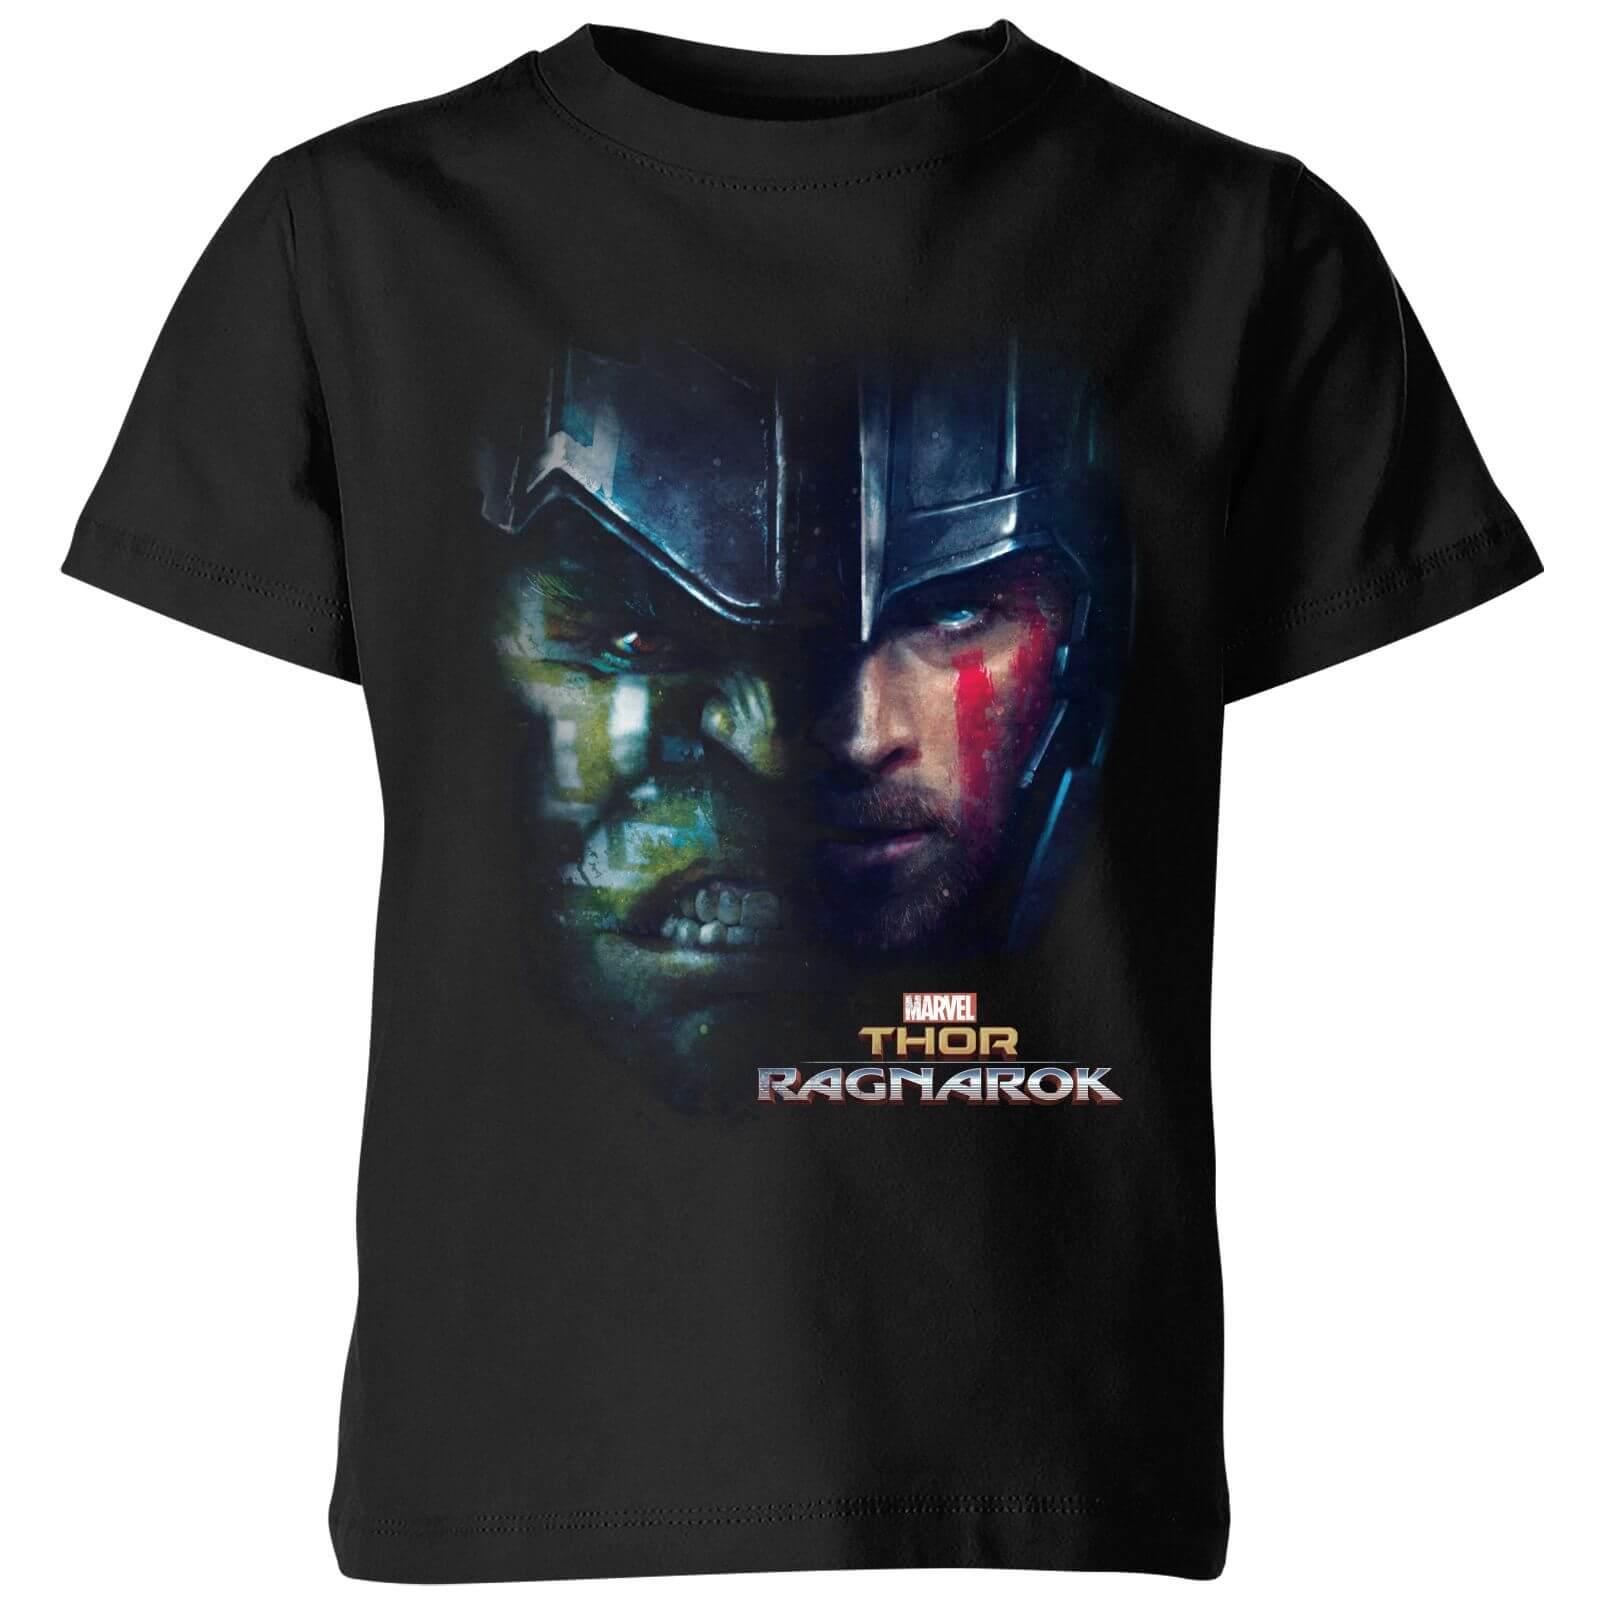 OfferteWeb.click 35-t-shirt-marvel-thor-ragnarok-hulk-split-face-nero